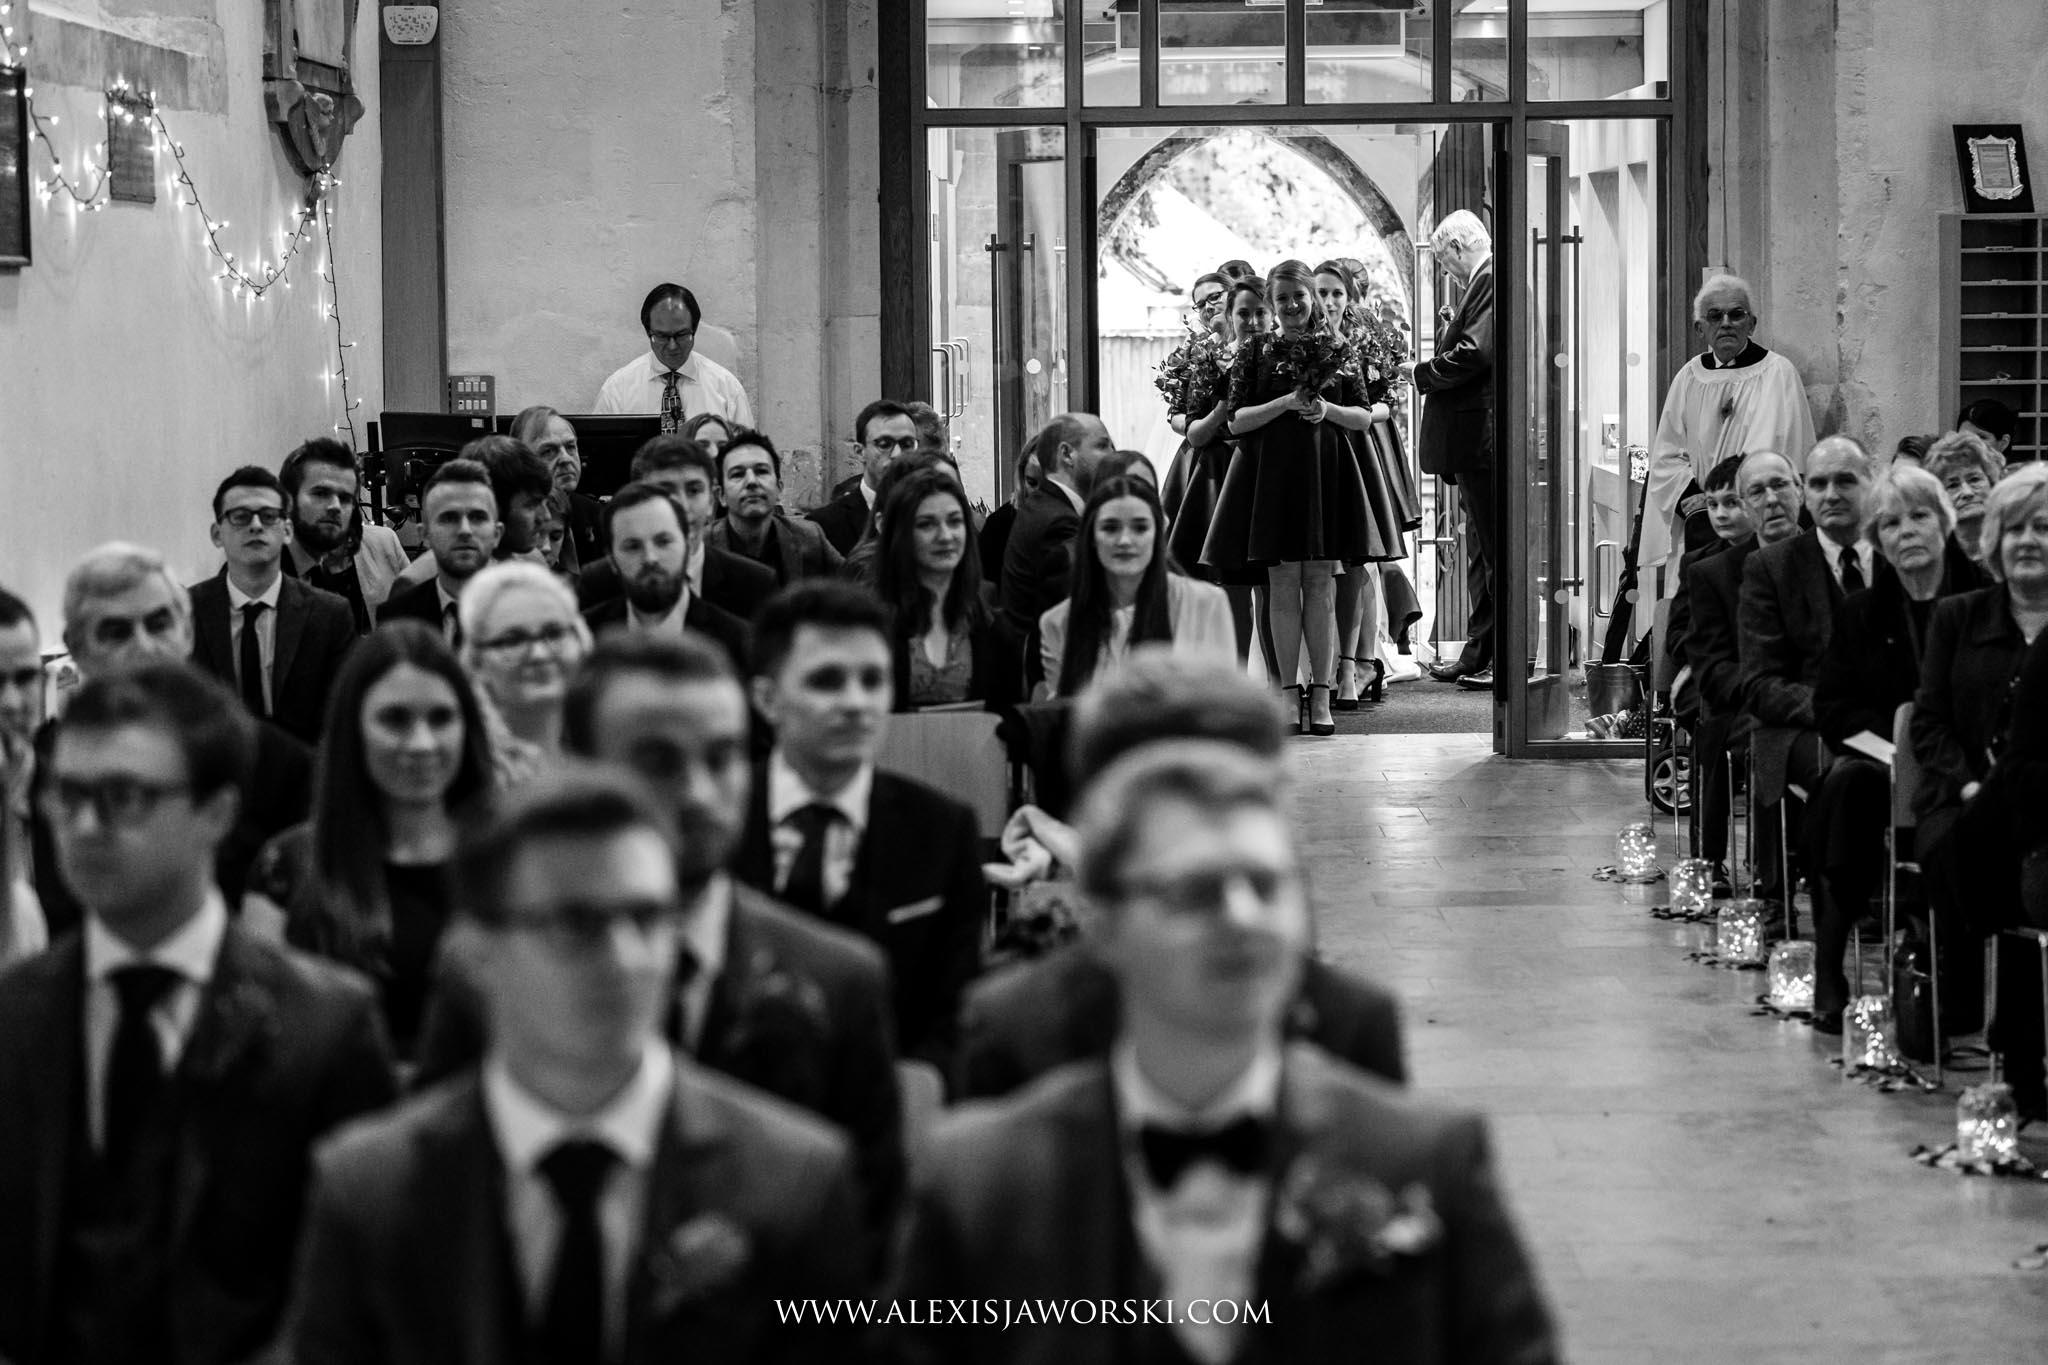 entering the church